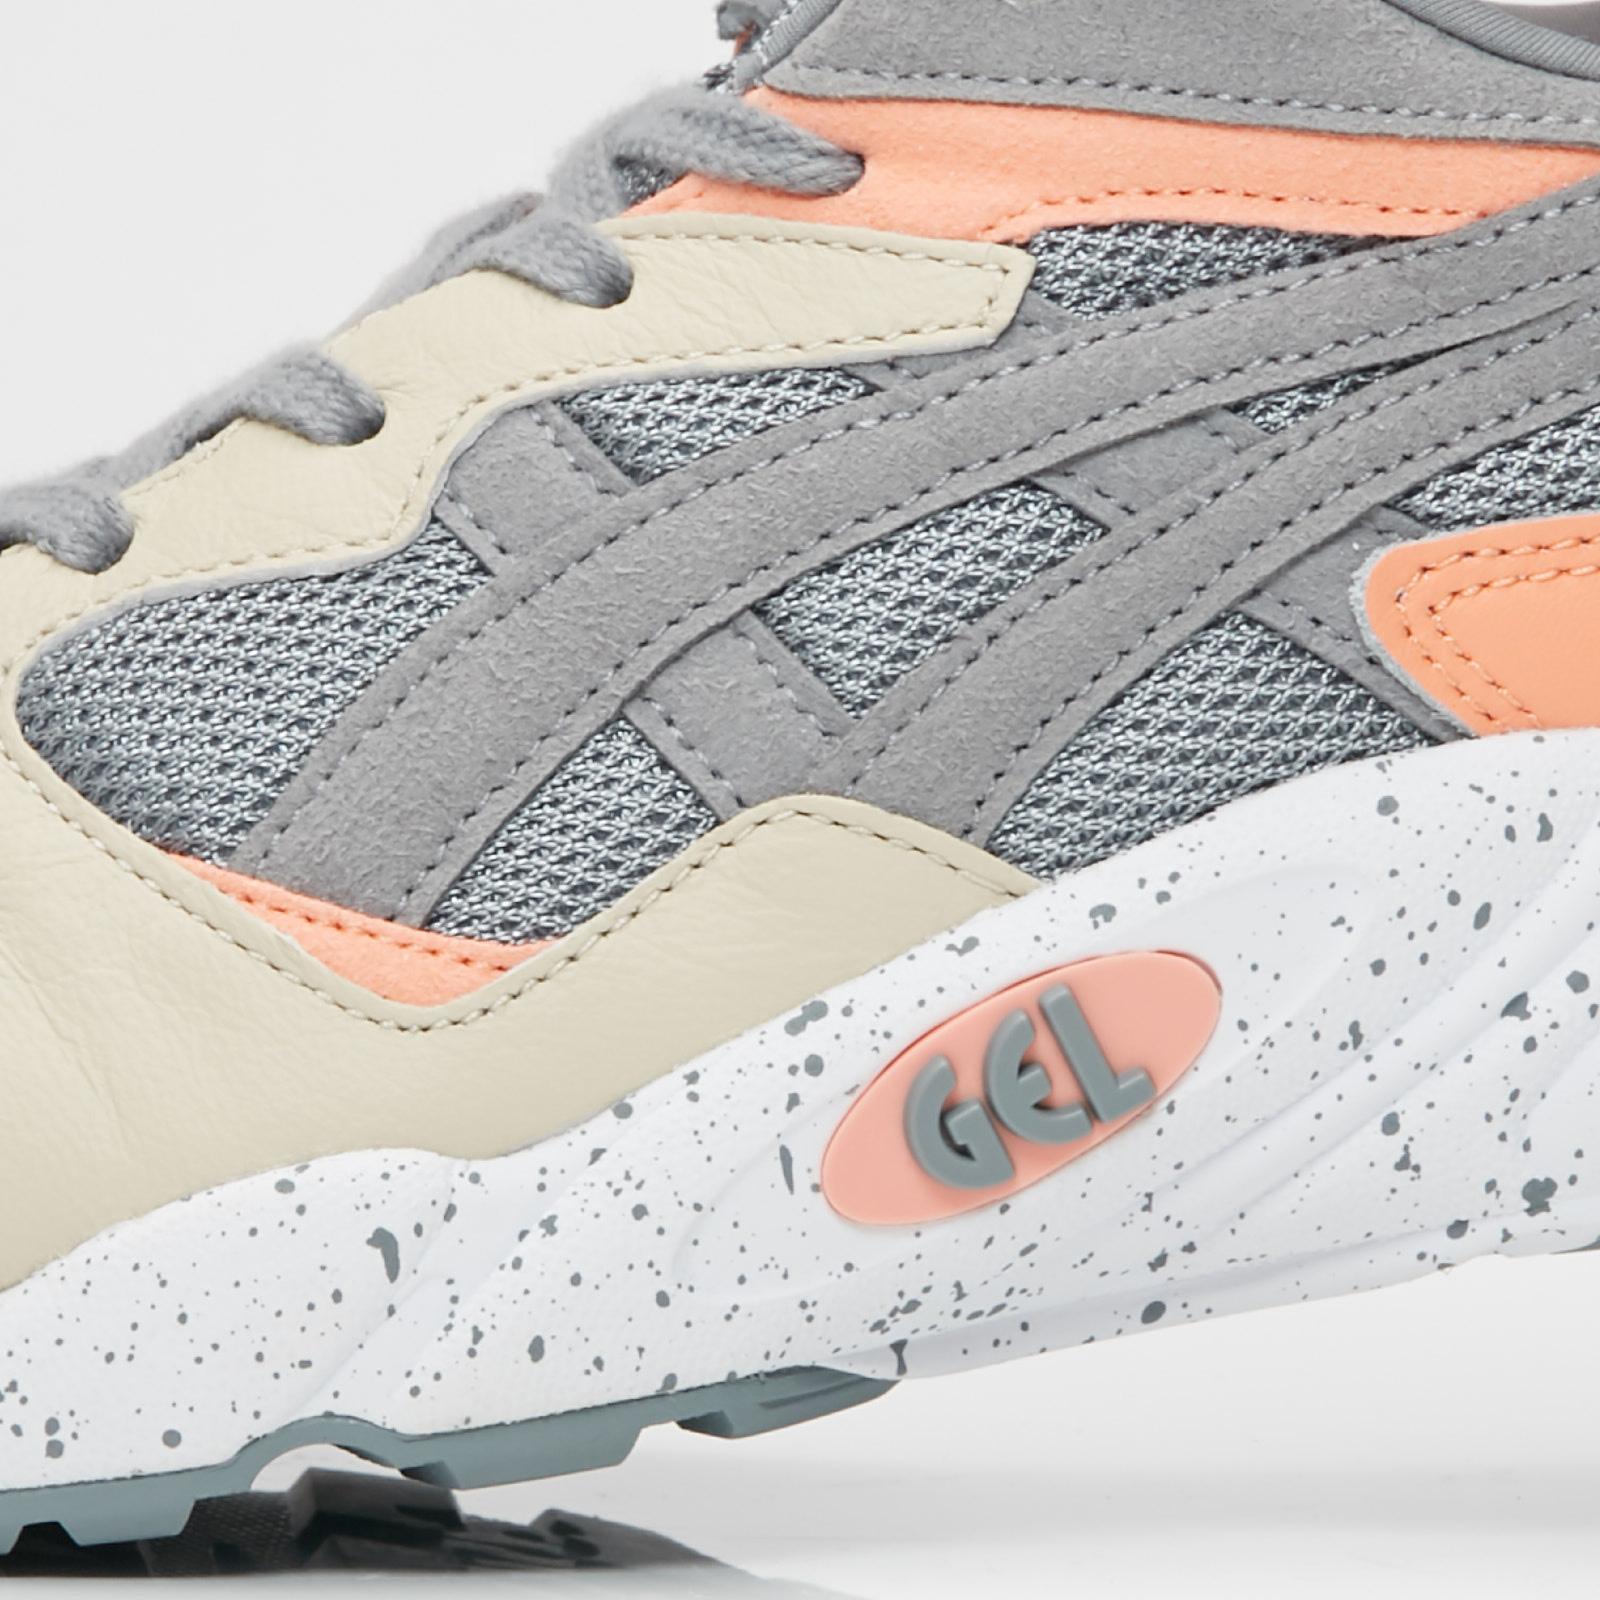 ASICS Gel Diablo STR H809l 1111 Sneakersnstuff I